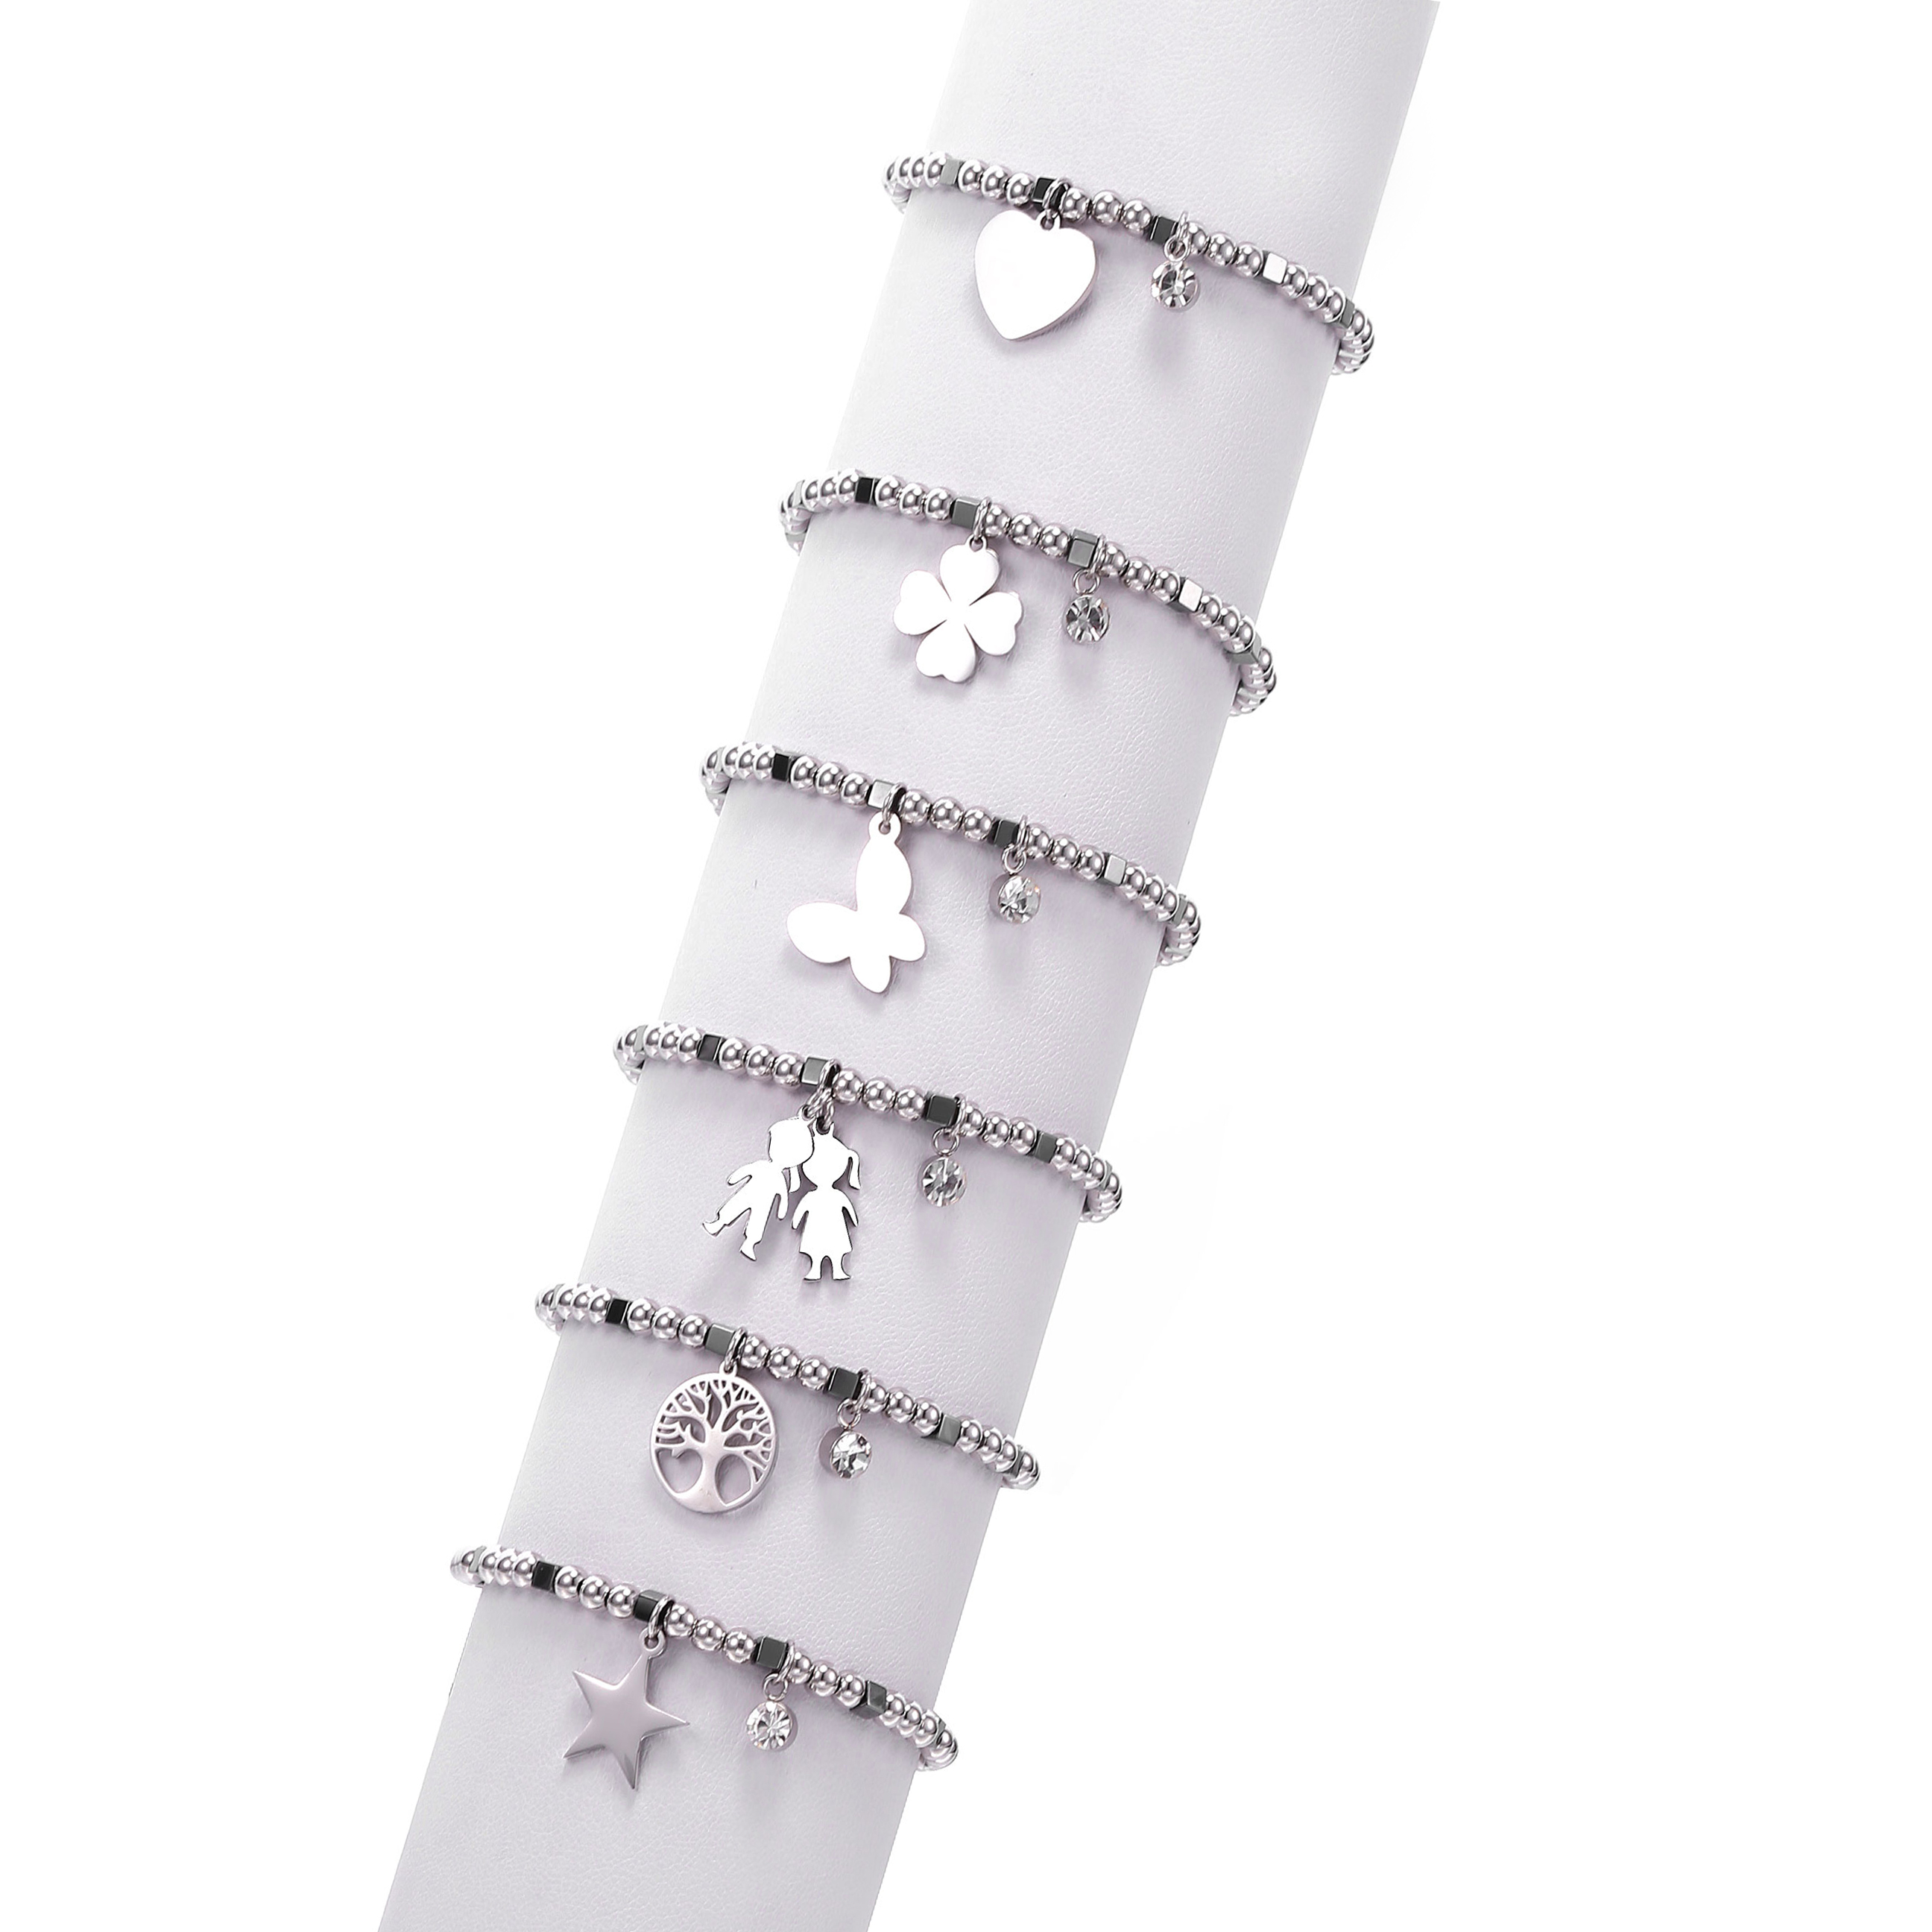 Simple Heart Star Figure Tree of Life Four Clover Charm Bracelet Stainless Steel Beads Crystal Bracelet Women 2019 Steel Jewelry(China)